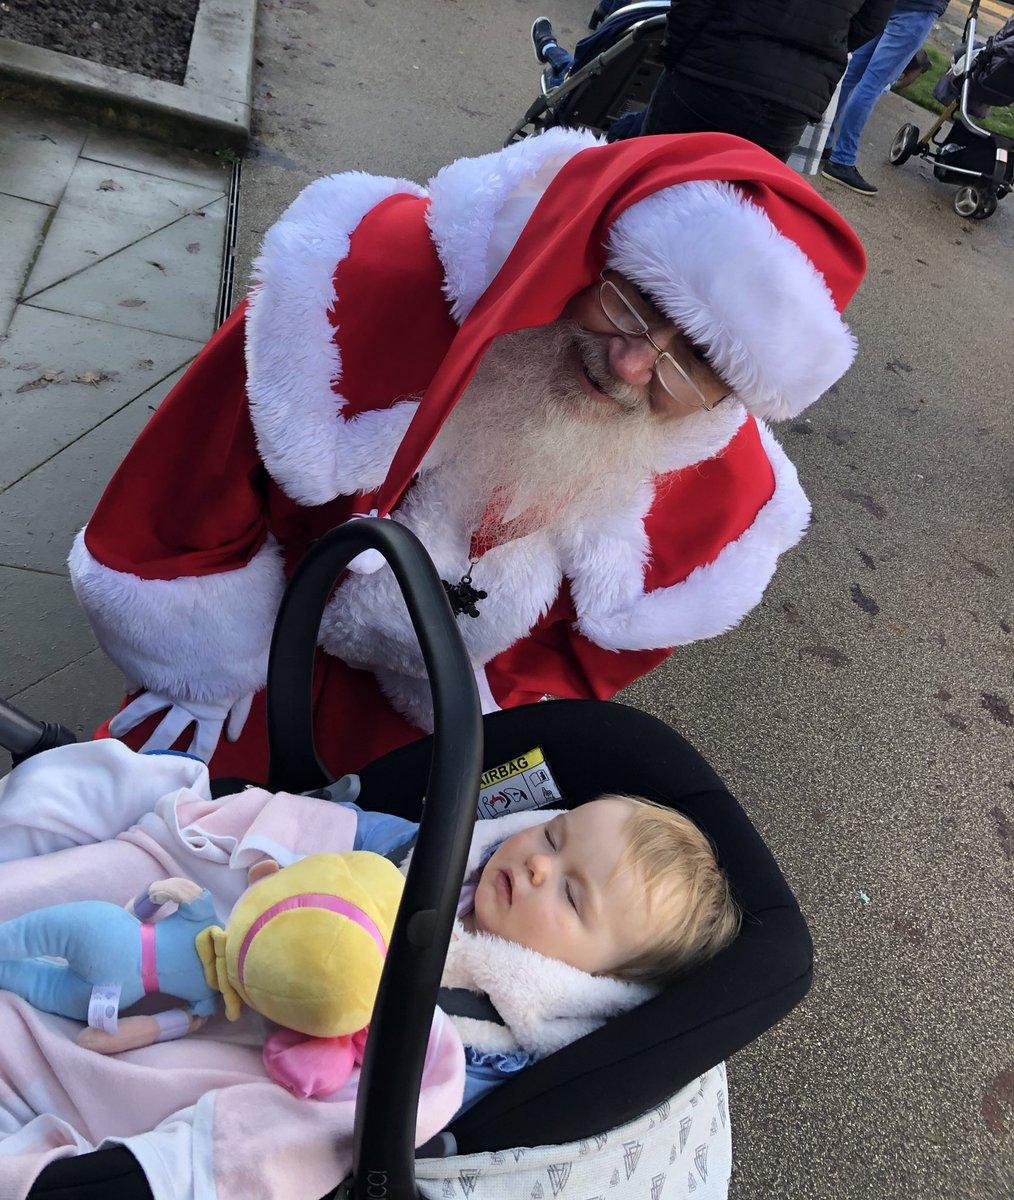 When Heidi met Santa but was asleep #babyheidi #babysfirstchristmas #fatherchristmas #christmaspic.twitter.com/F4MmggS3yk